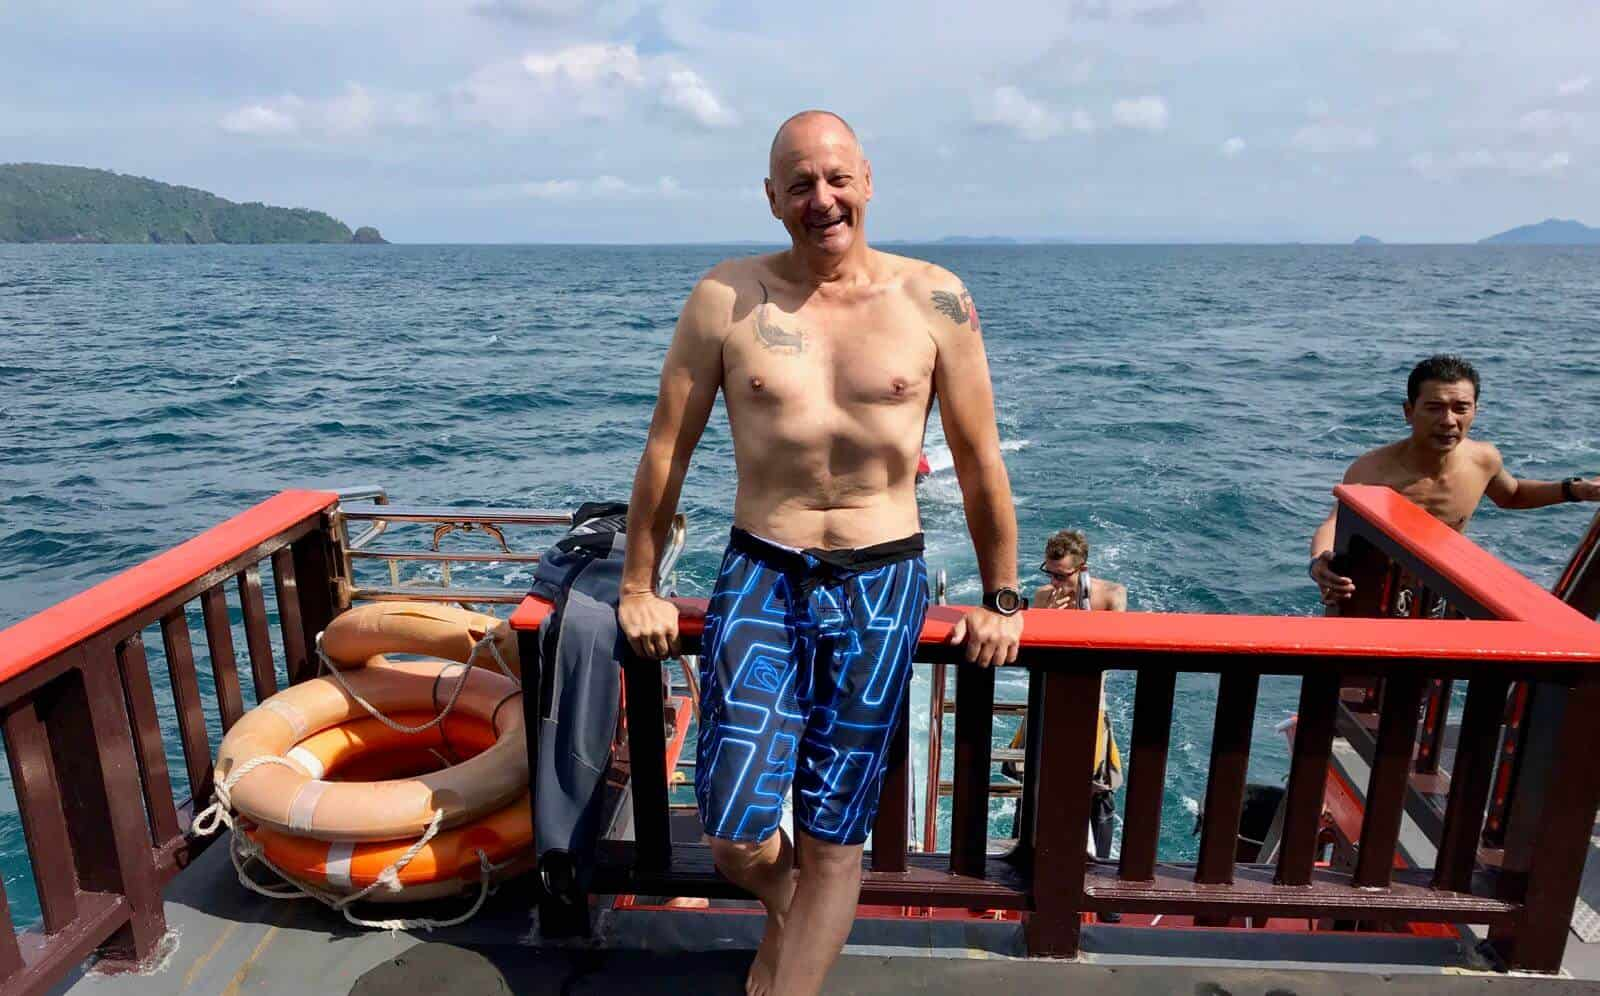 Koh Chang apnea freediving betternotstop